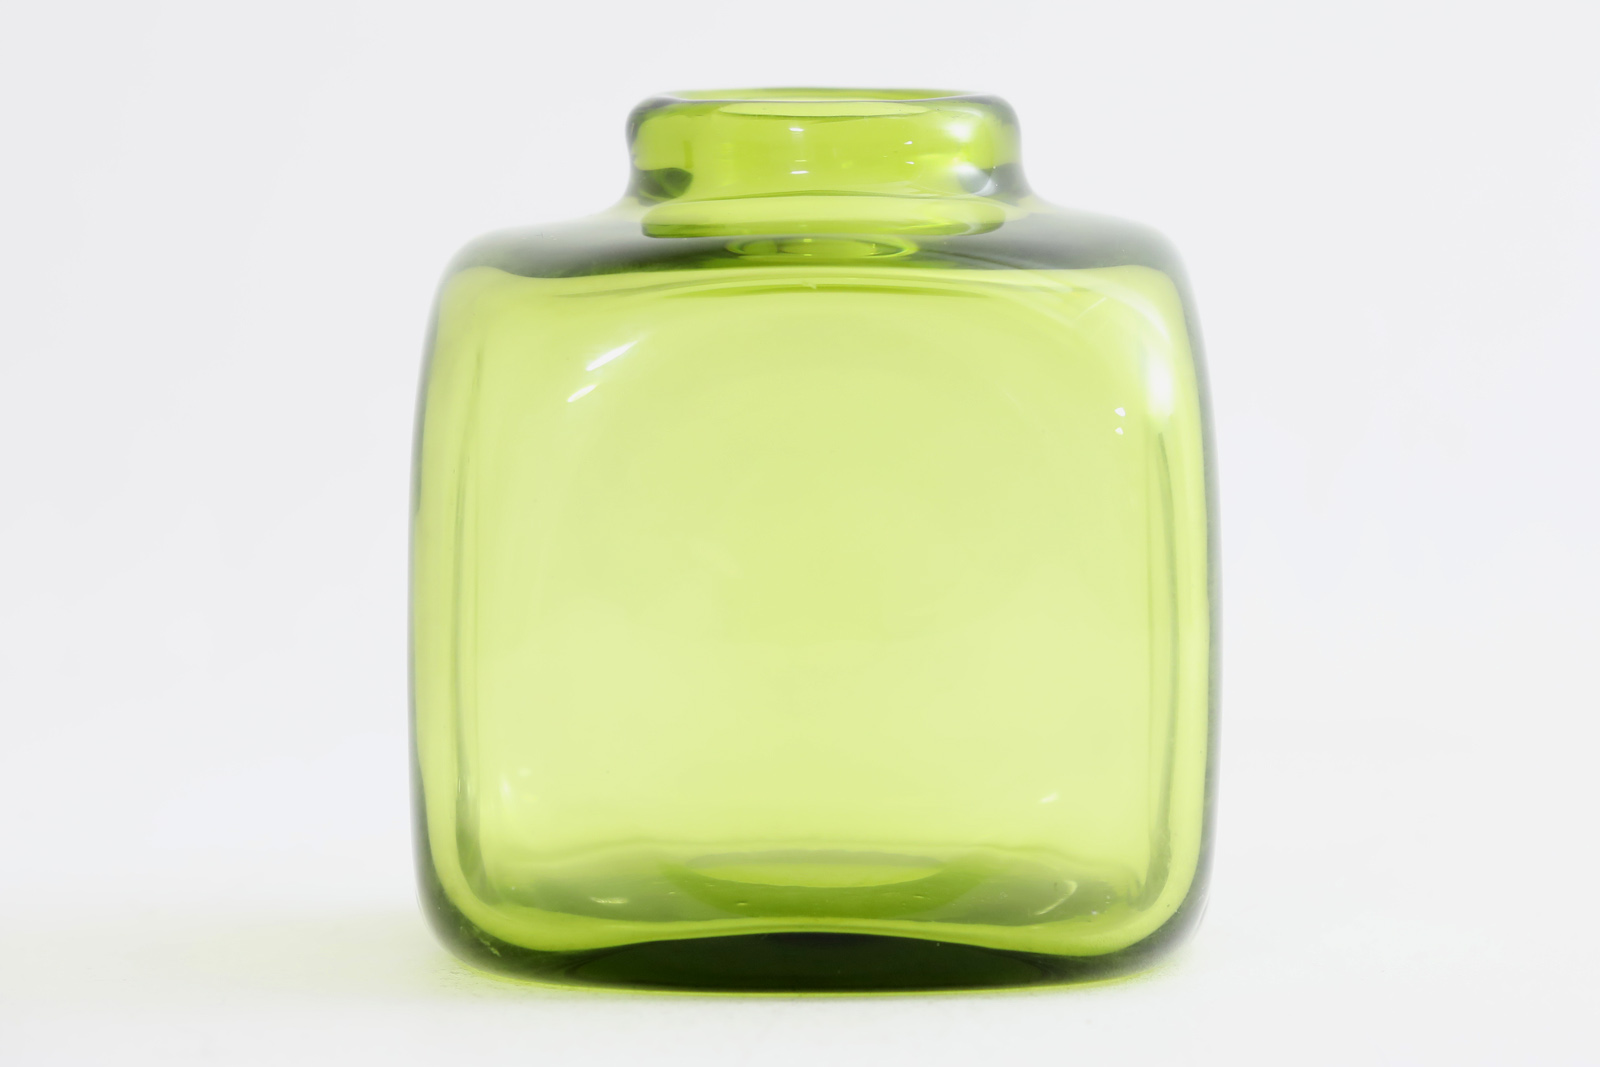 Holmegaardホルムガード ビンテージ 鮮やかなグリーンカラーのフラワーベース【北欧雑貨 ビンテージ雑貨 アンティーク品 エリックホグラン ガラス オブジェ 花瓶 一輪挿し】